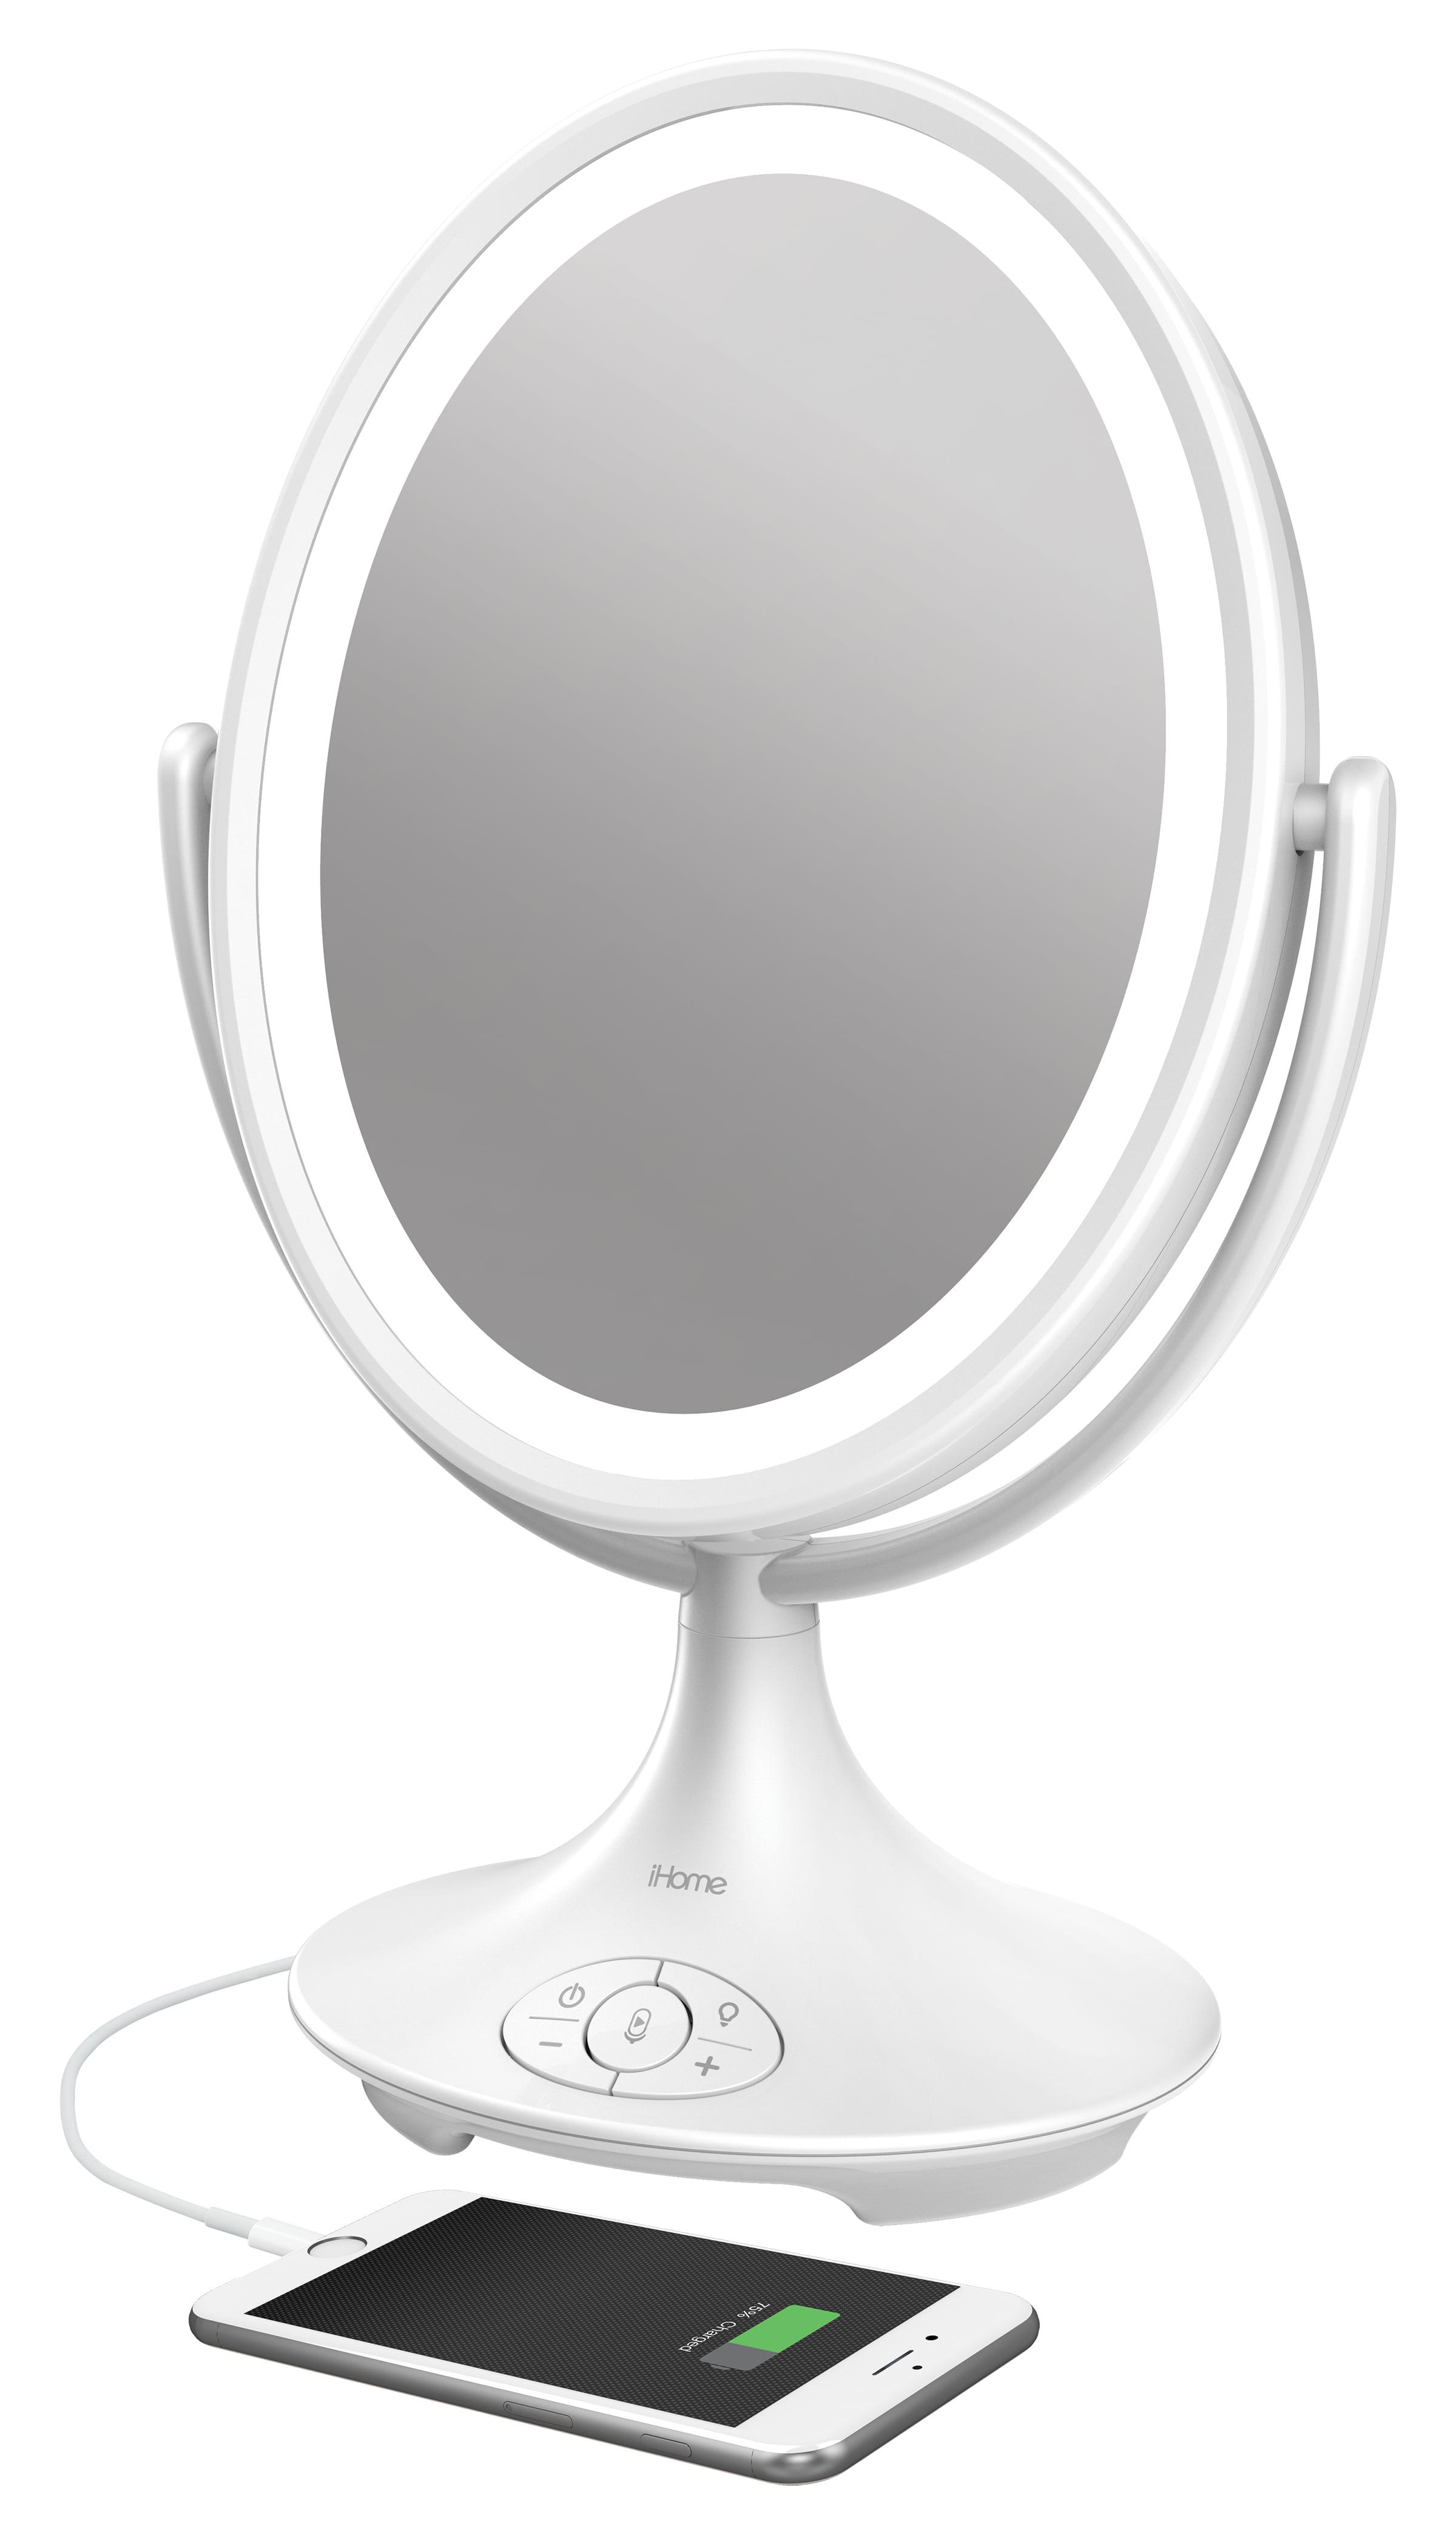 Ihome Magnify Vanity Mirror Icvbt6 6 Double Sided Vanity Mirror Makeup Mirror Led With Bluetooth Audio Speakerphone And Usb Charging Walmart Com Walmart Com